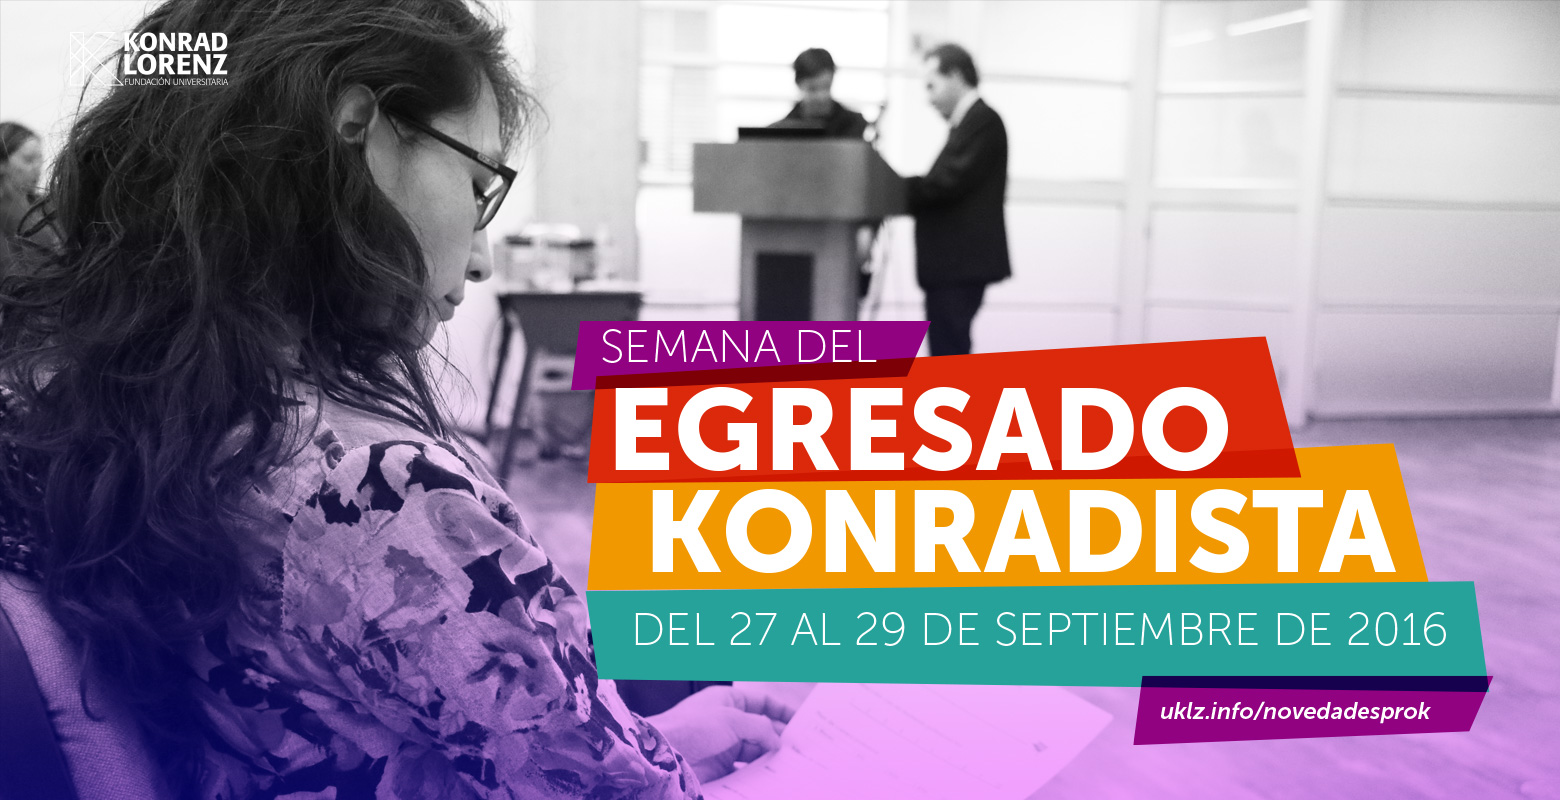 Semana del Egresado Konradista